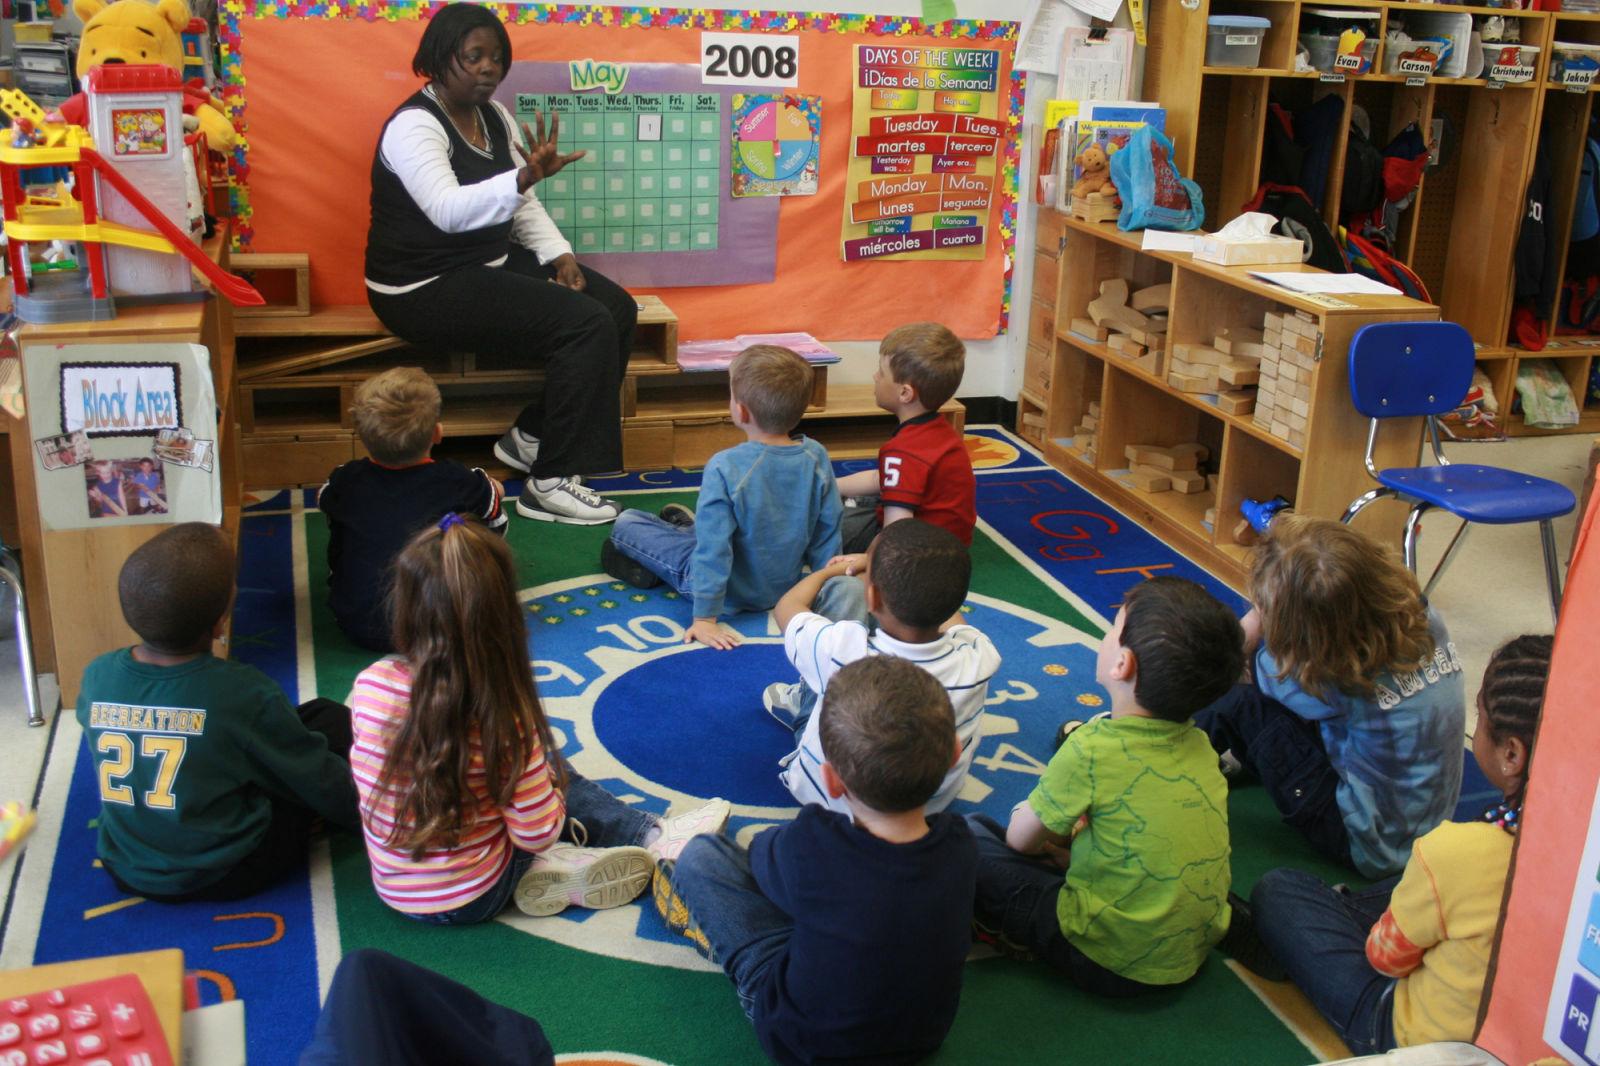 School education learning 1750587 h p1snew